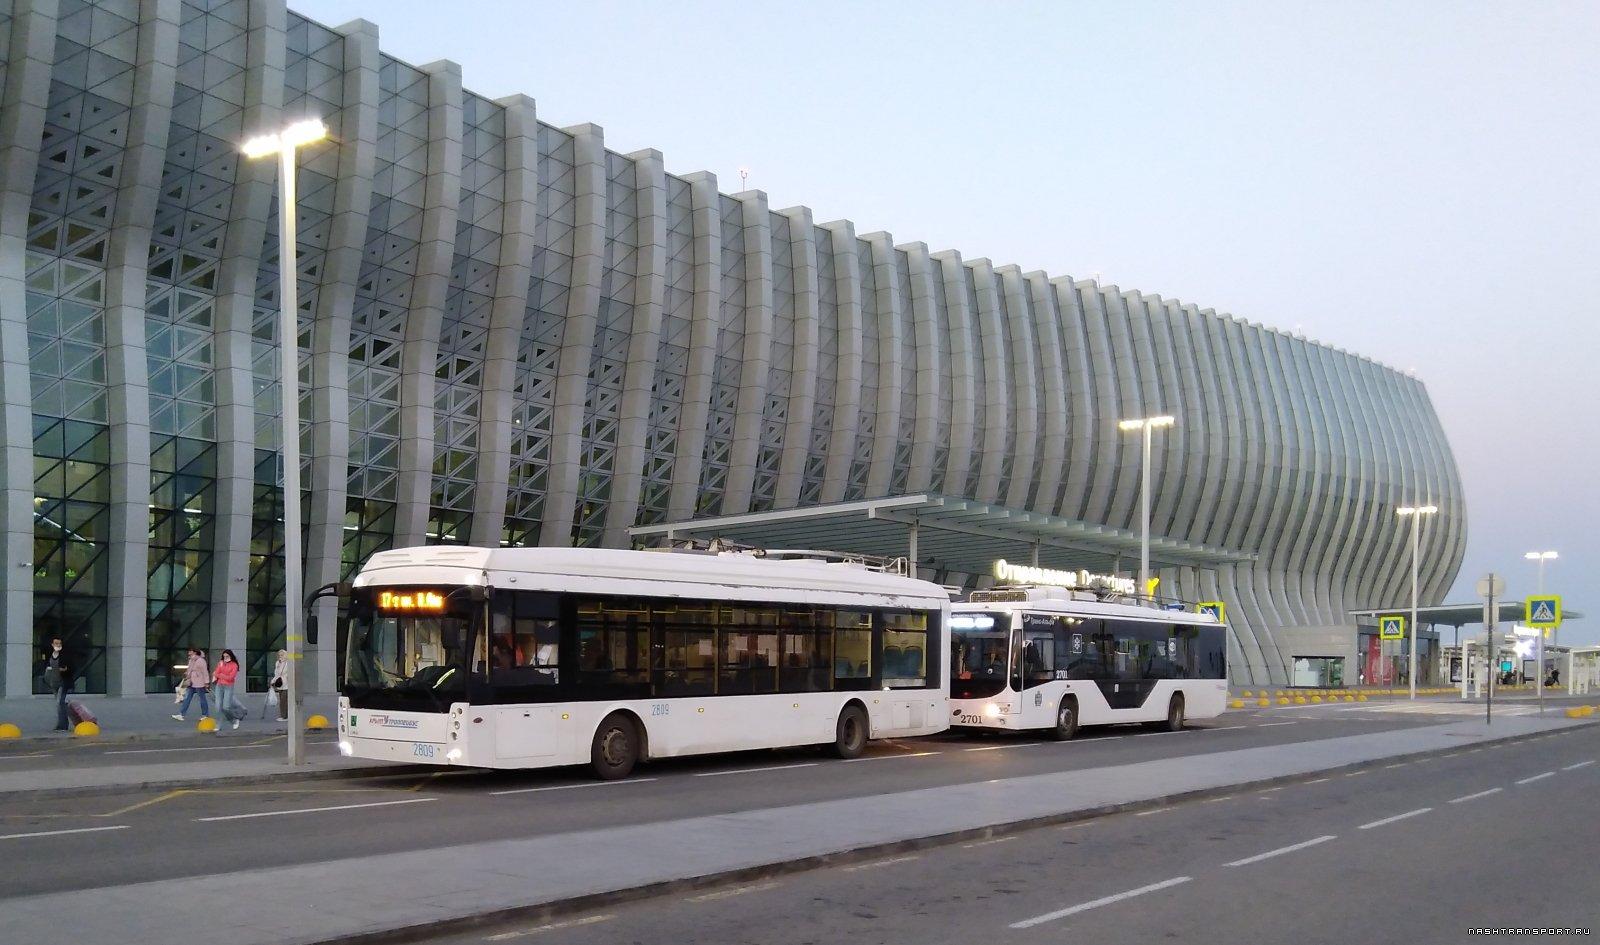 1уу. Троллейбусы в аэропорту.